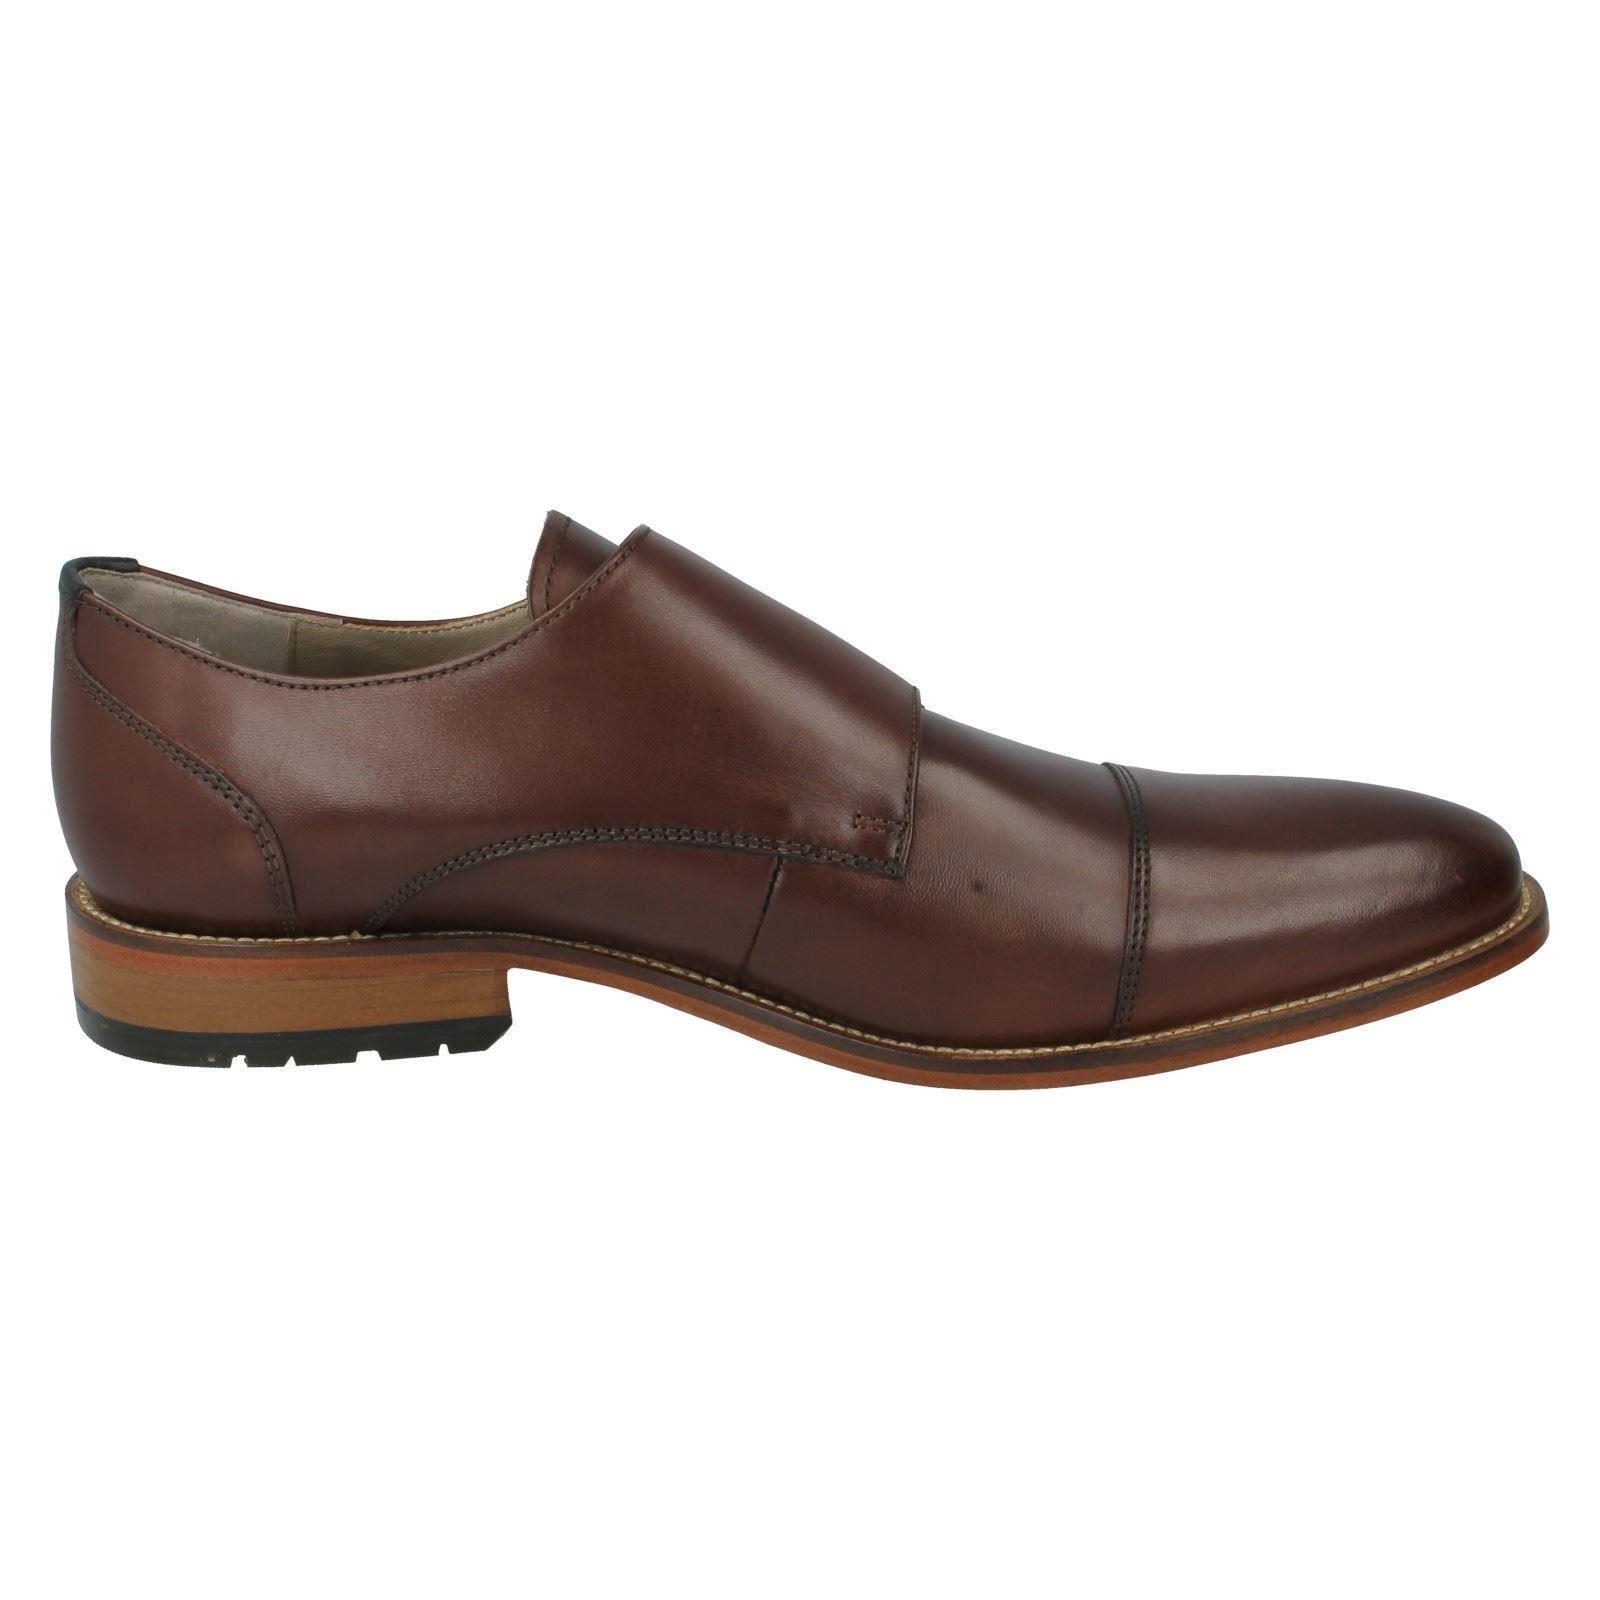 Men's Clarks Smart Shoes Penton Penton Penton Monk 9f5e11